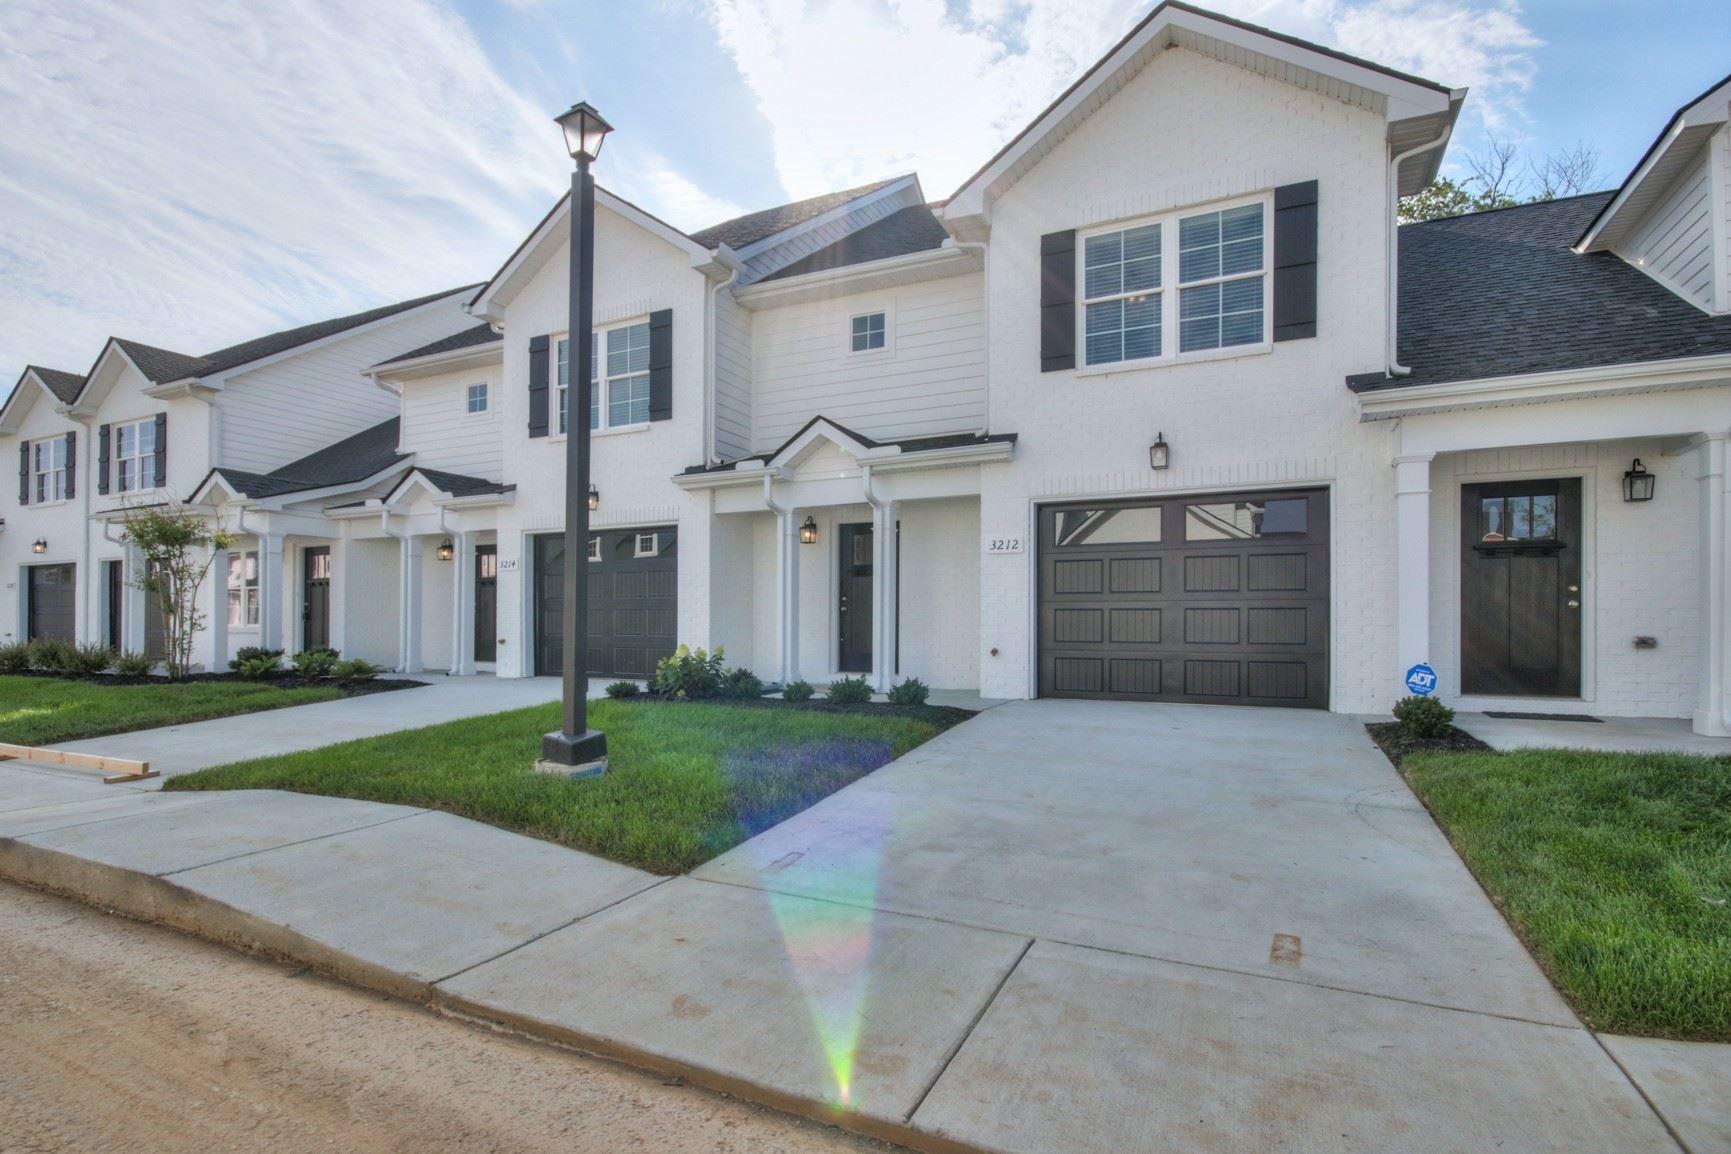 3212 Clemons Circle, Murfreesboro, TN 37128 - MLS#: 2151501